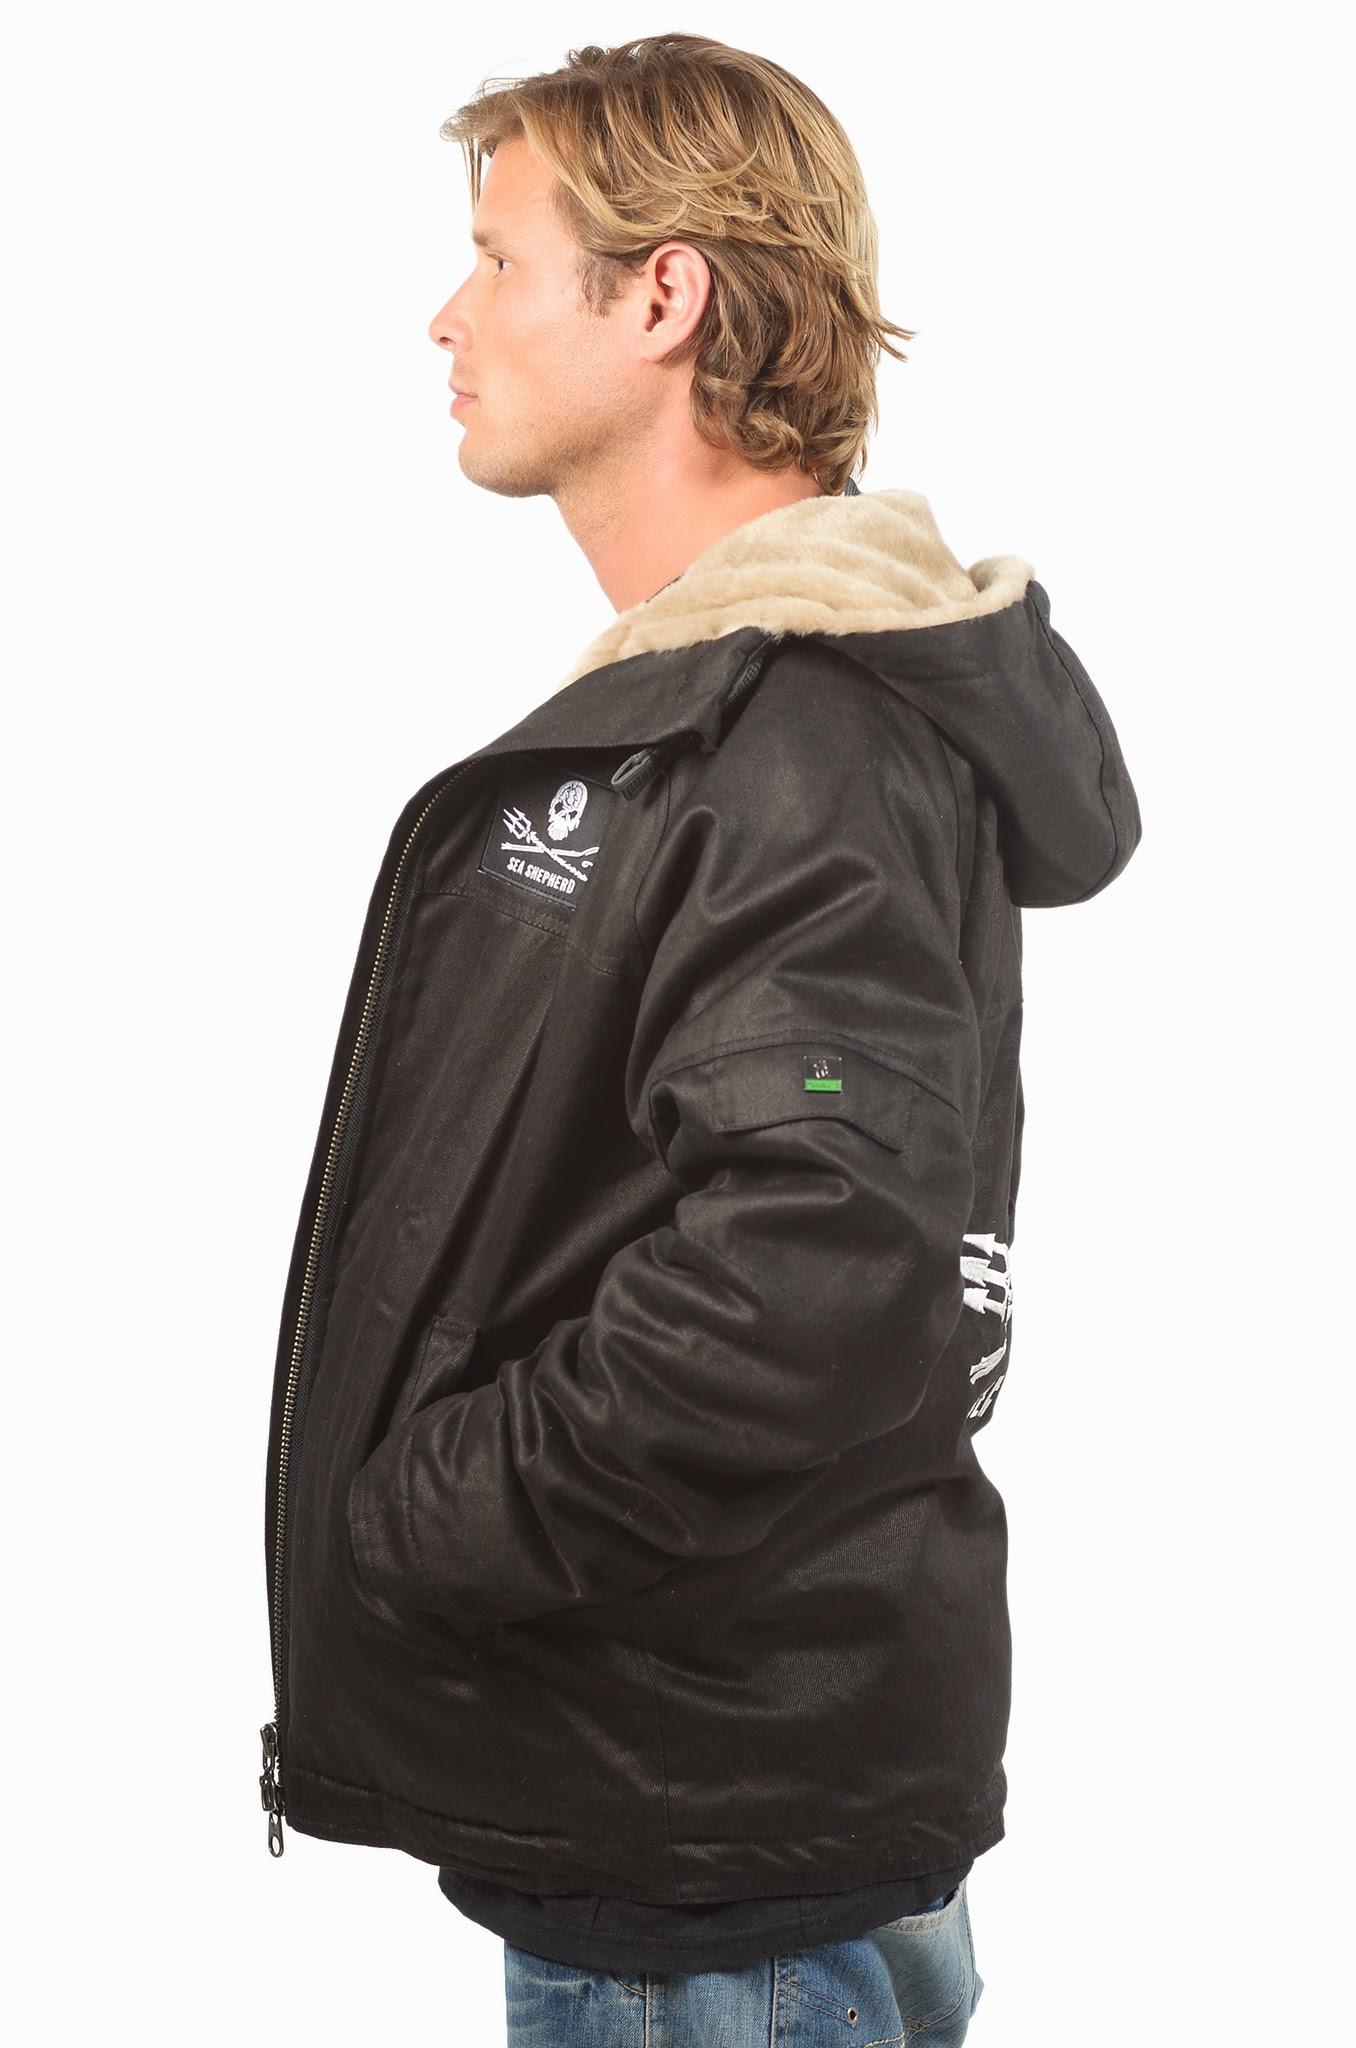 Men's Sea Shepherd Classic Hoodlamb Jacket - MCH-SEAS